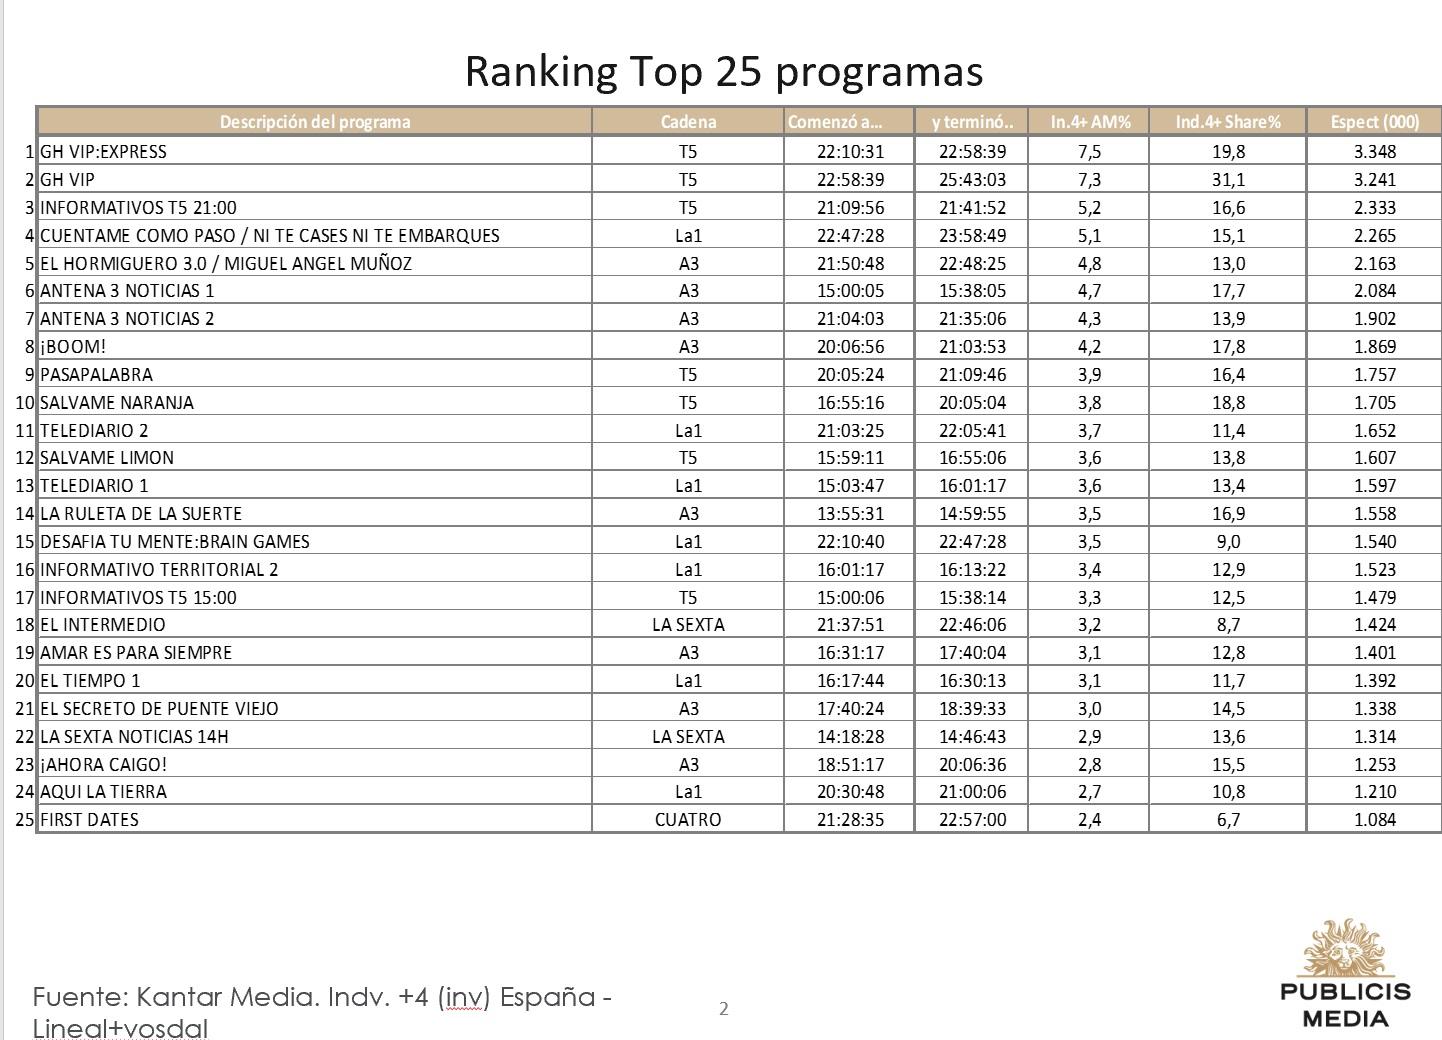 https://www.programapublicidad.com/wp-content/uploads/2018/09/top-25-publicis-media-27-sep-2018-programapublicidad-muy-grande.jpg